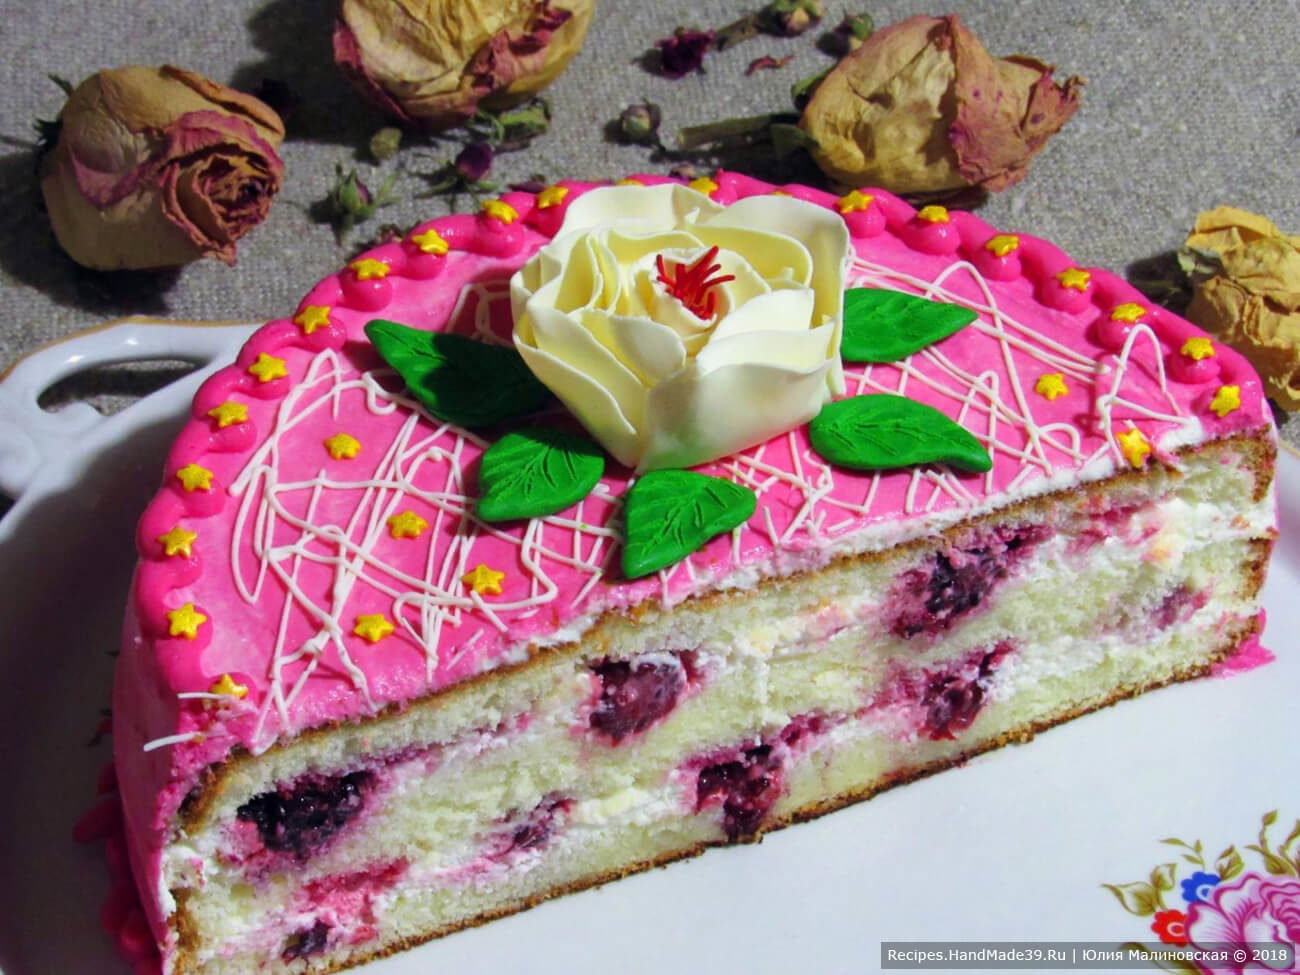 Торт «Ежевика» со сметанным кремом